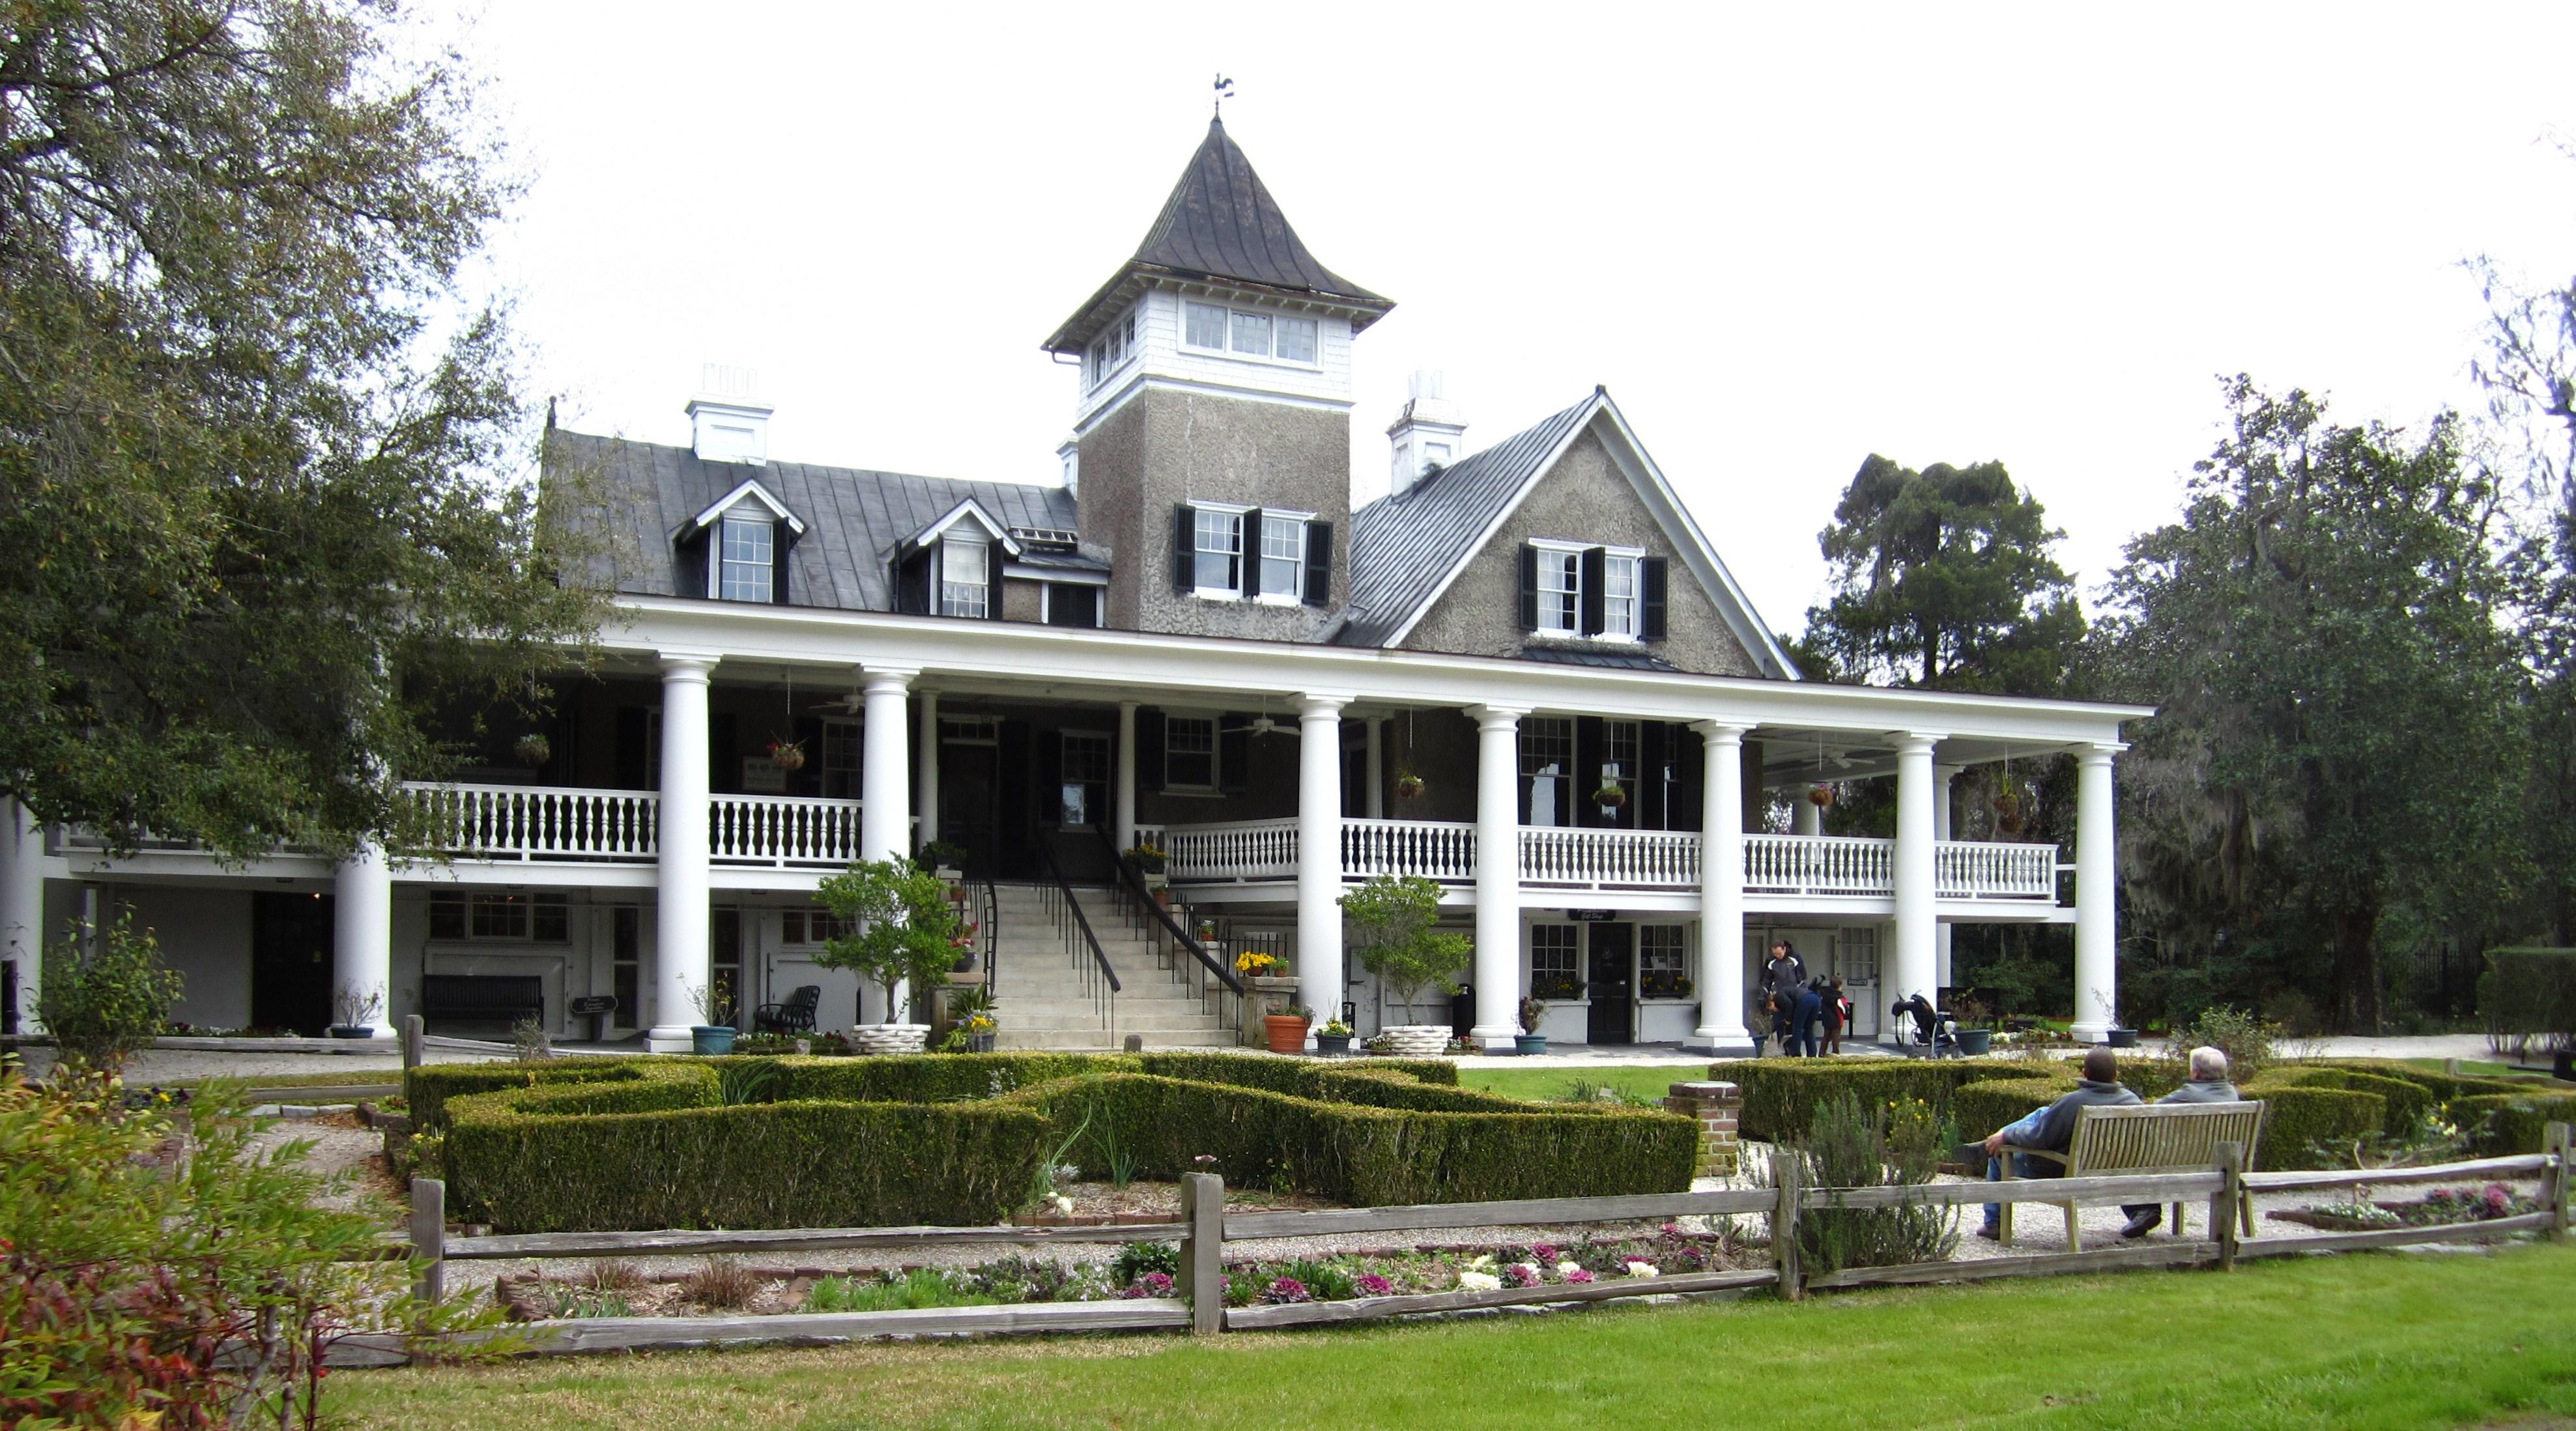 belgard pavers paver stones retaining walls hardscapes - Magnolia Gardens Nursing Home